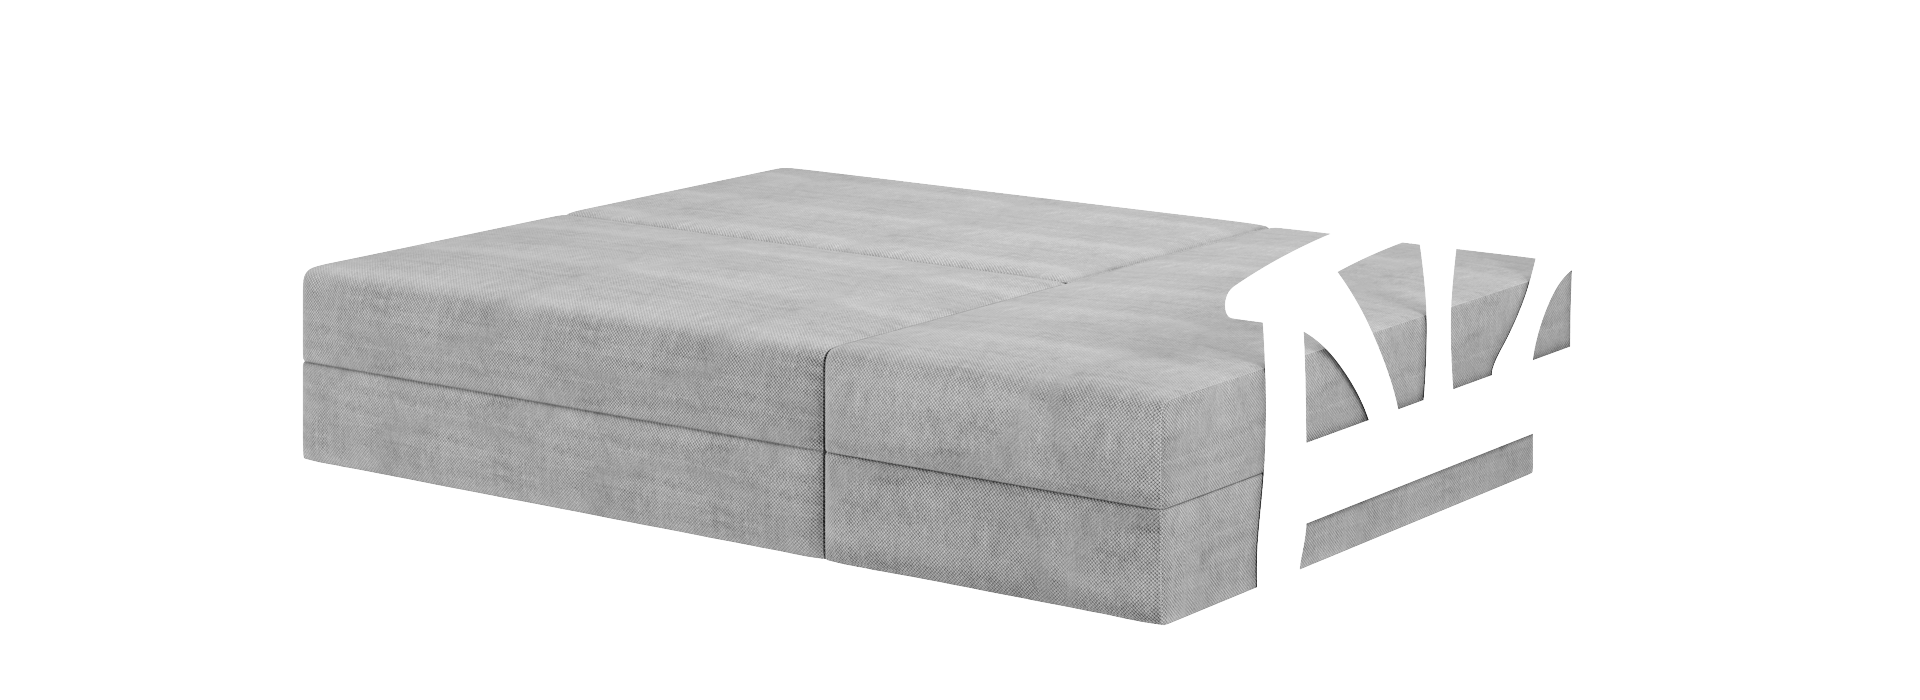 Тамми-5 угловой диван - маска 3